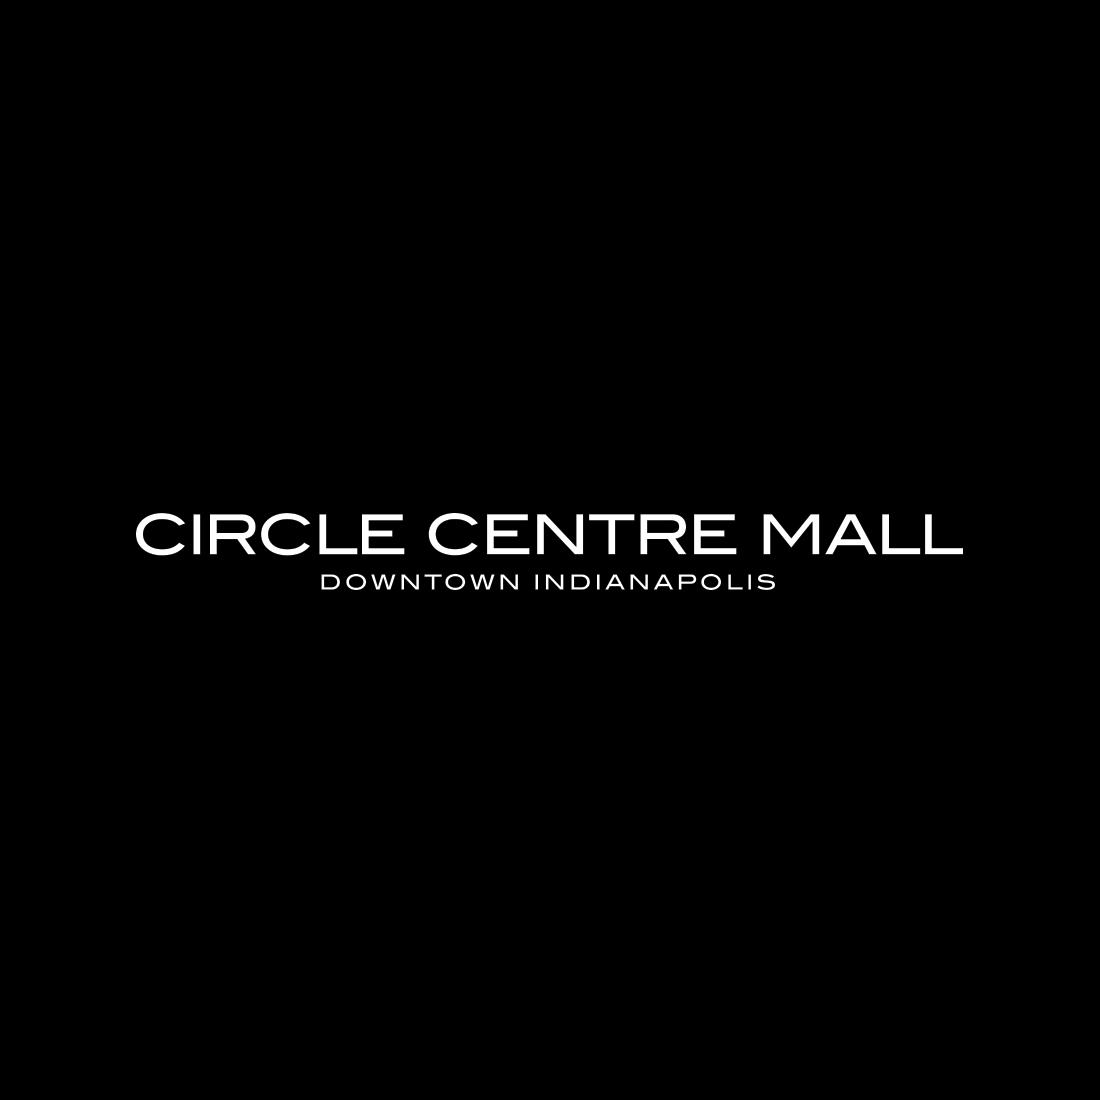 Circle Centre Mall image 7